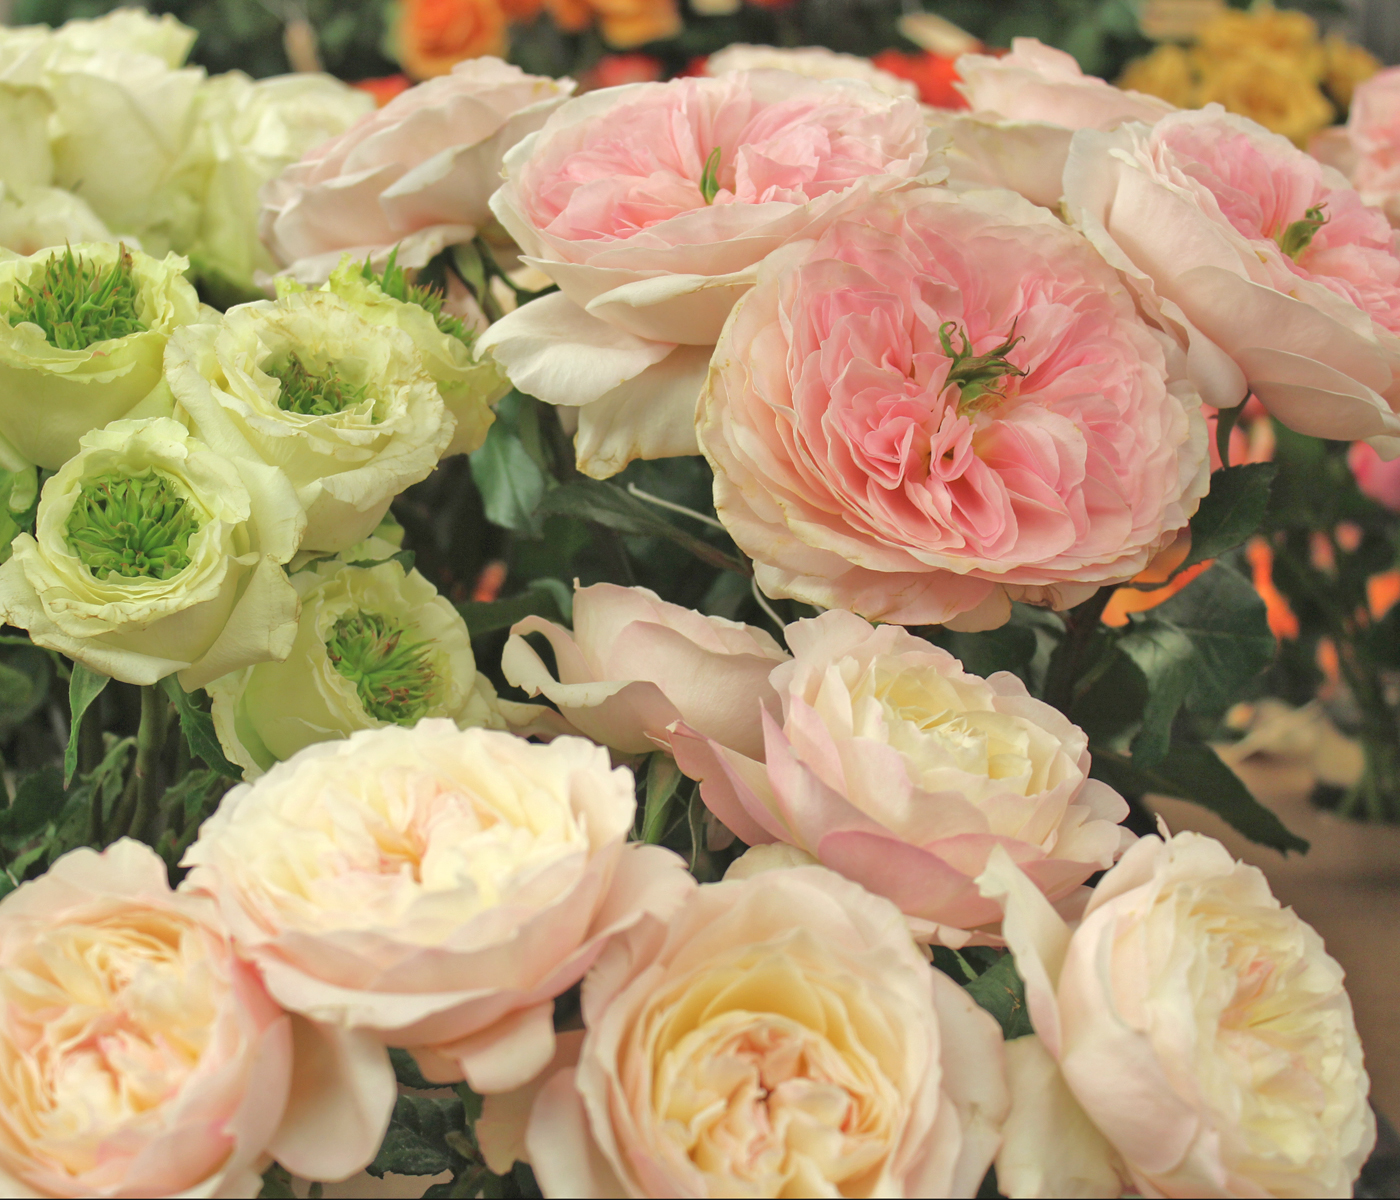 harvest-rose-9